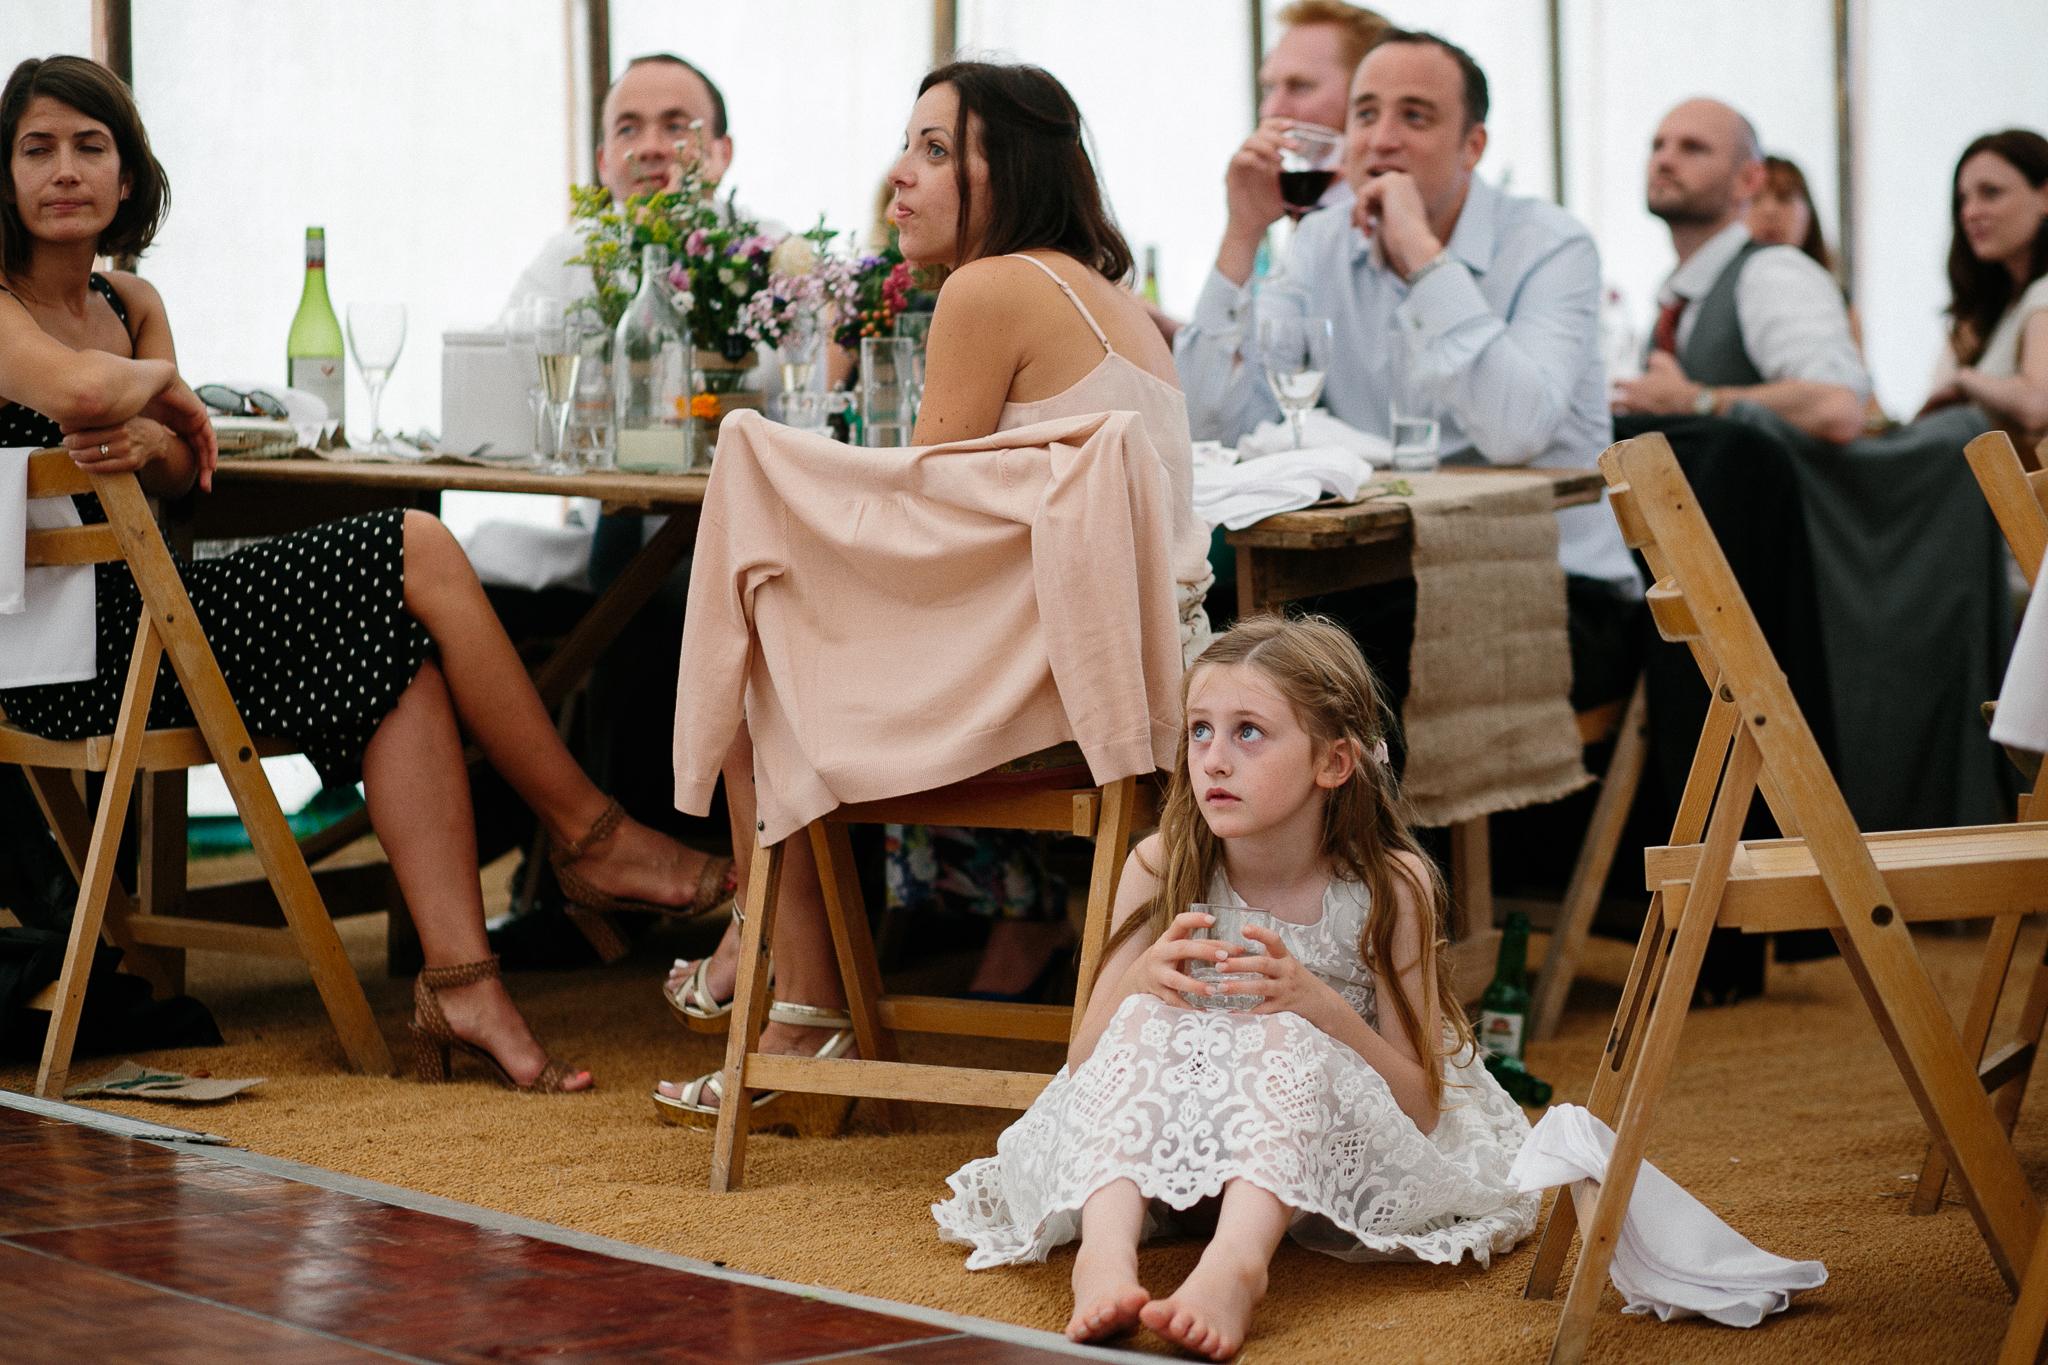 grantham_wedding_photographer-102.jpg